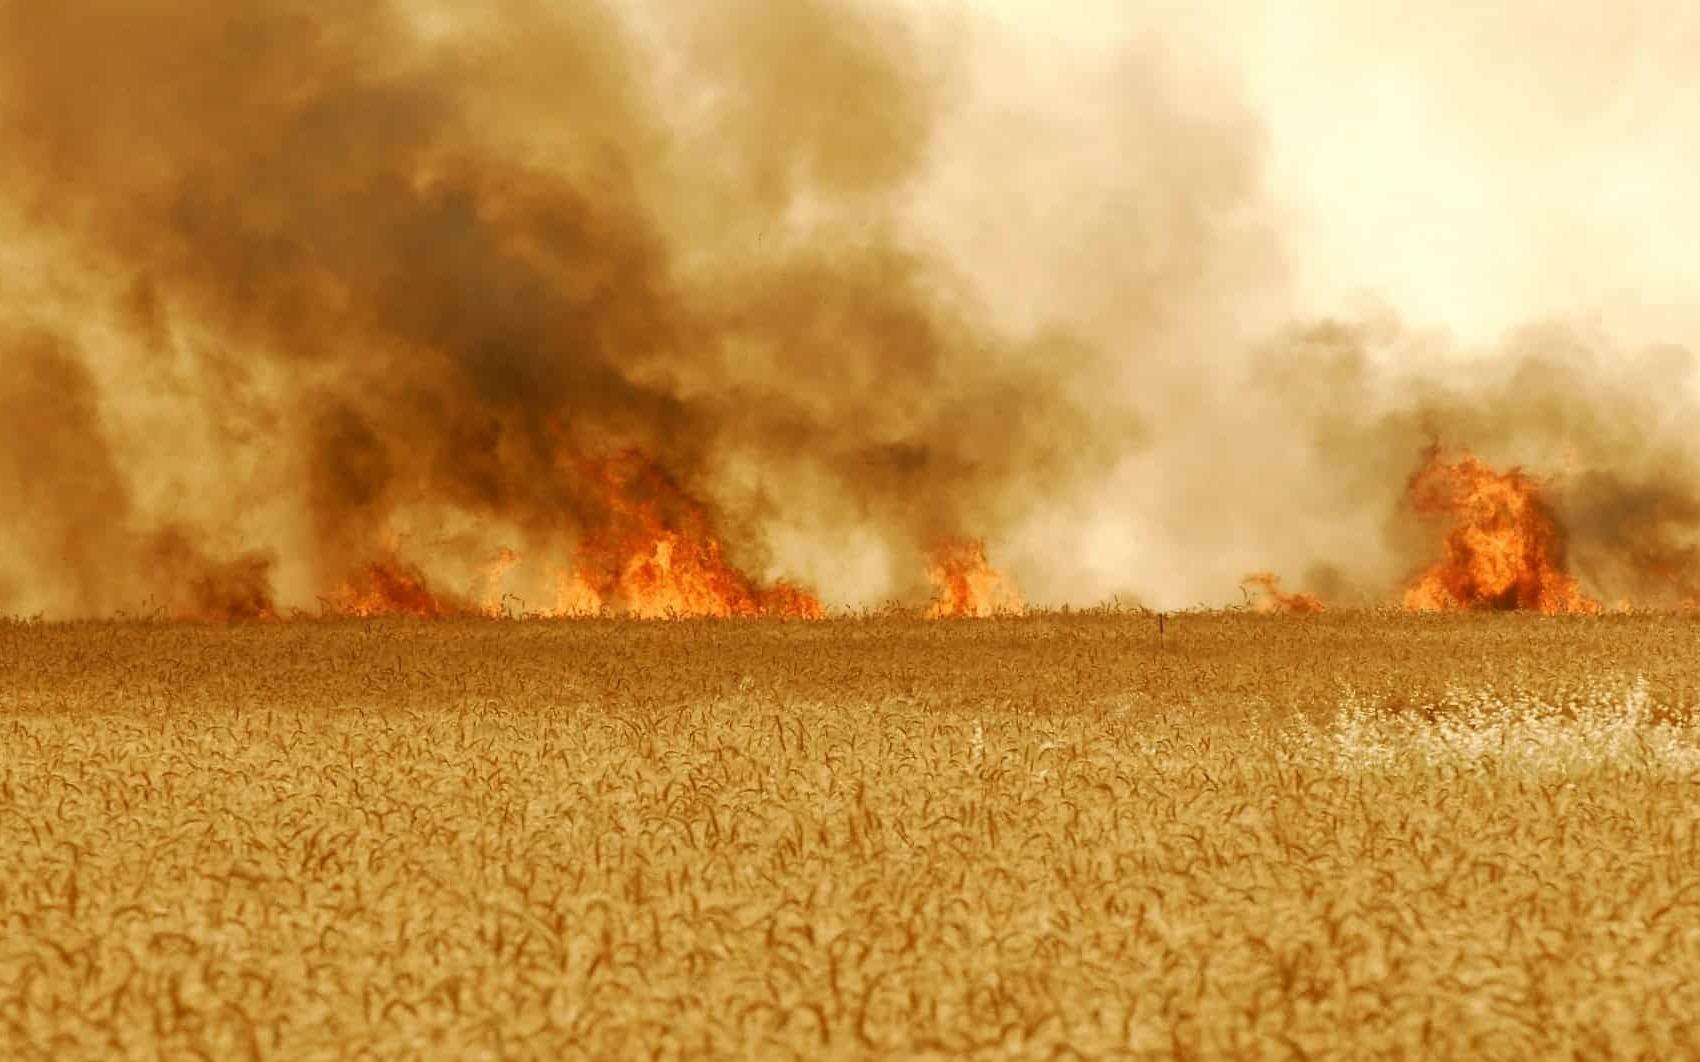 A field in Kibbutz Nir Am ablaze over rocket fire from the Gaza Strip. (Photo: Avi Ohayon/GPO)